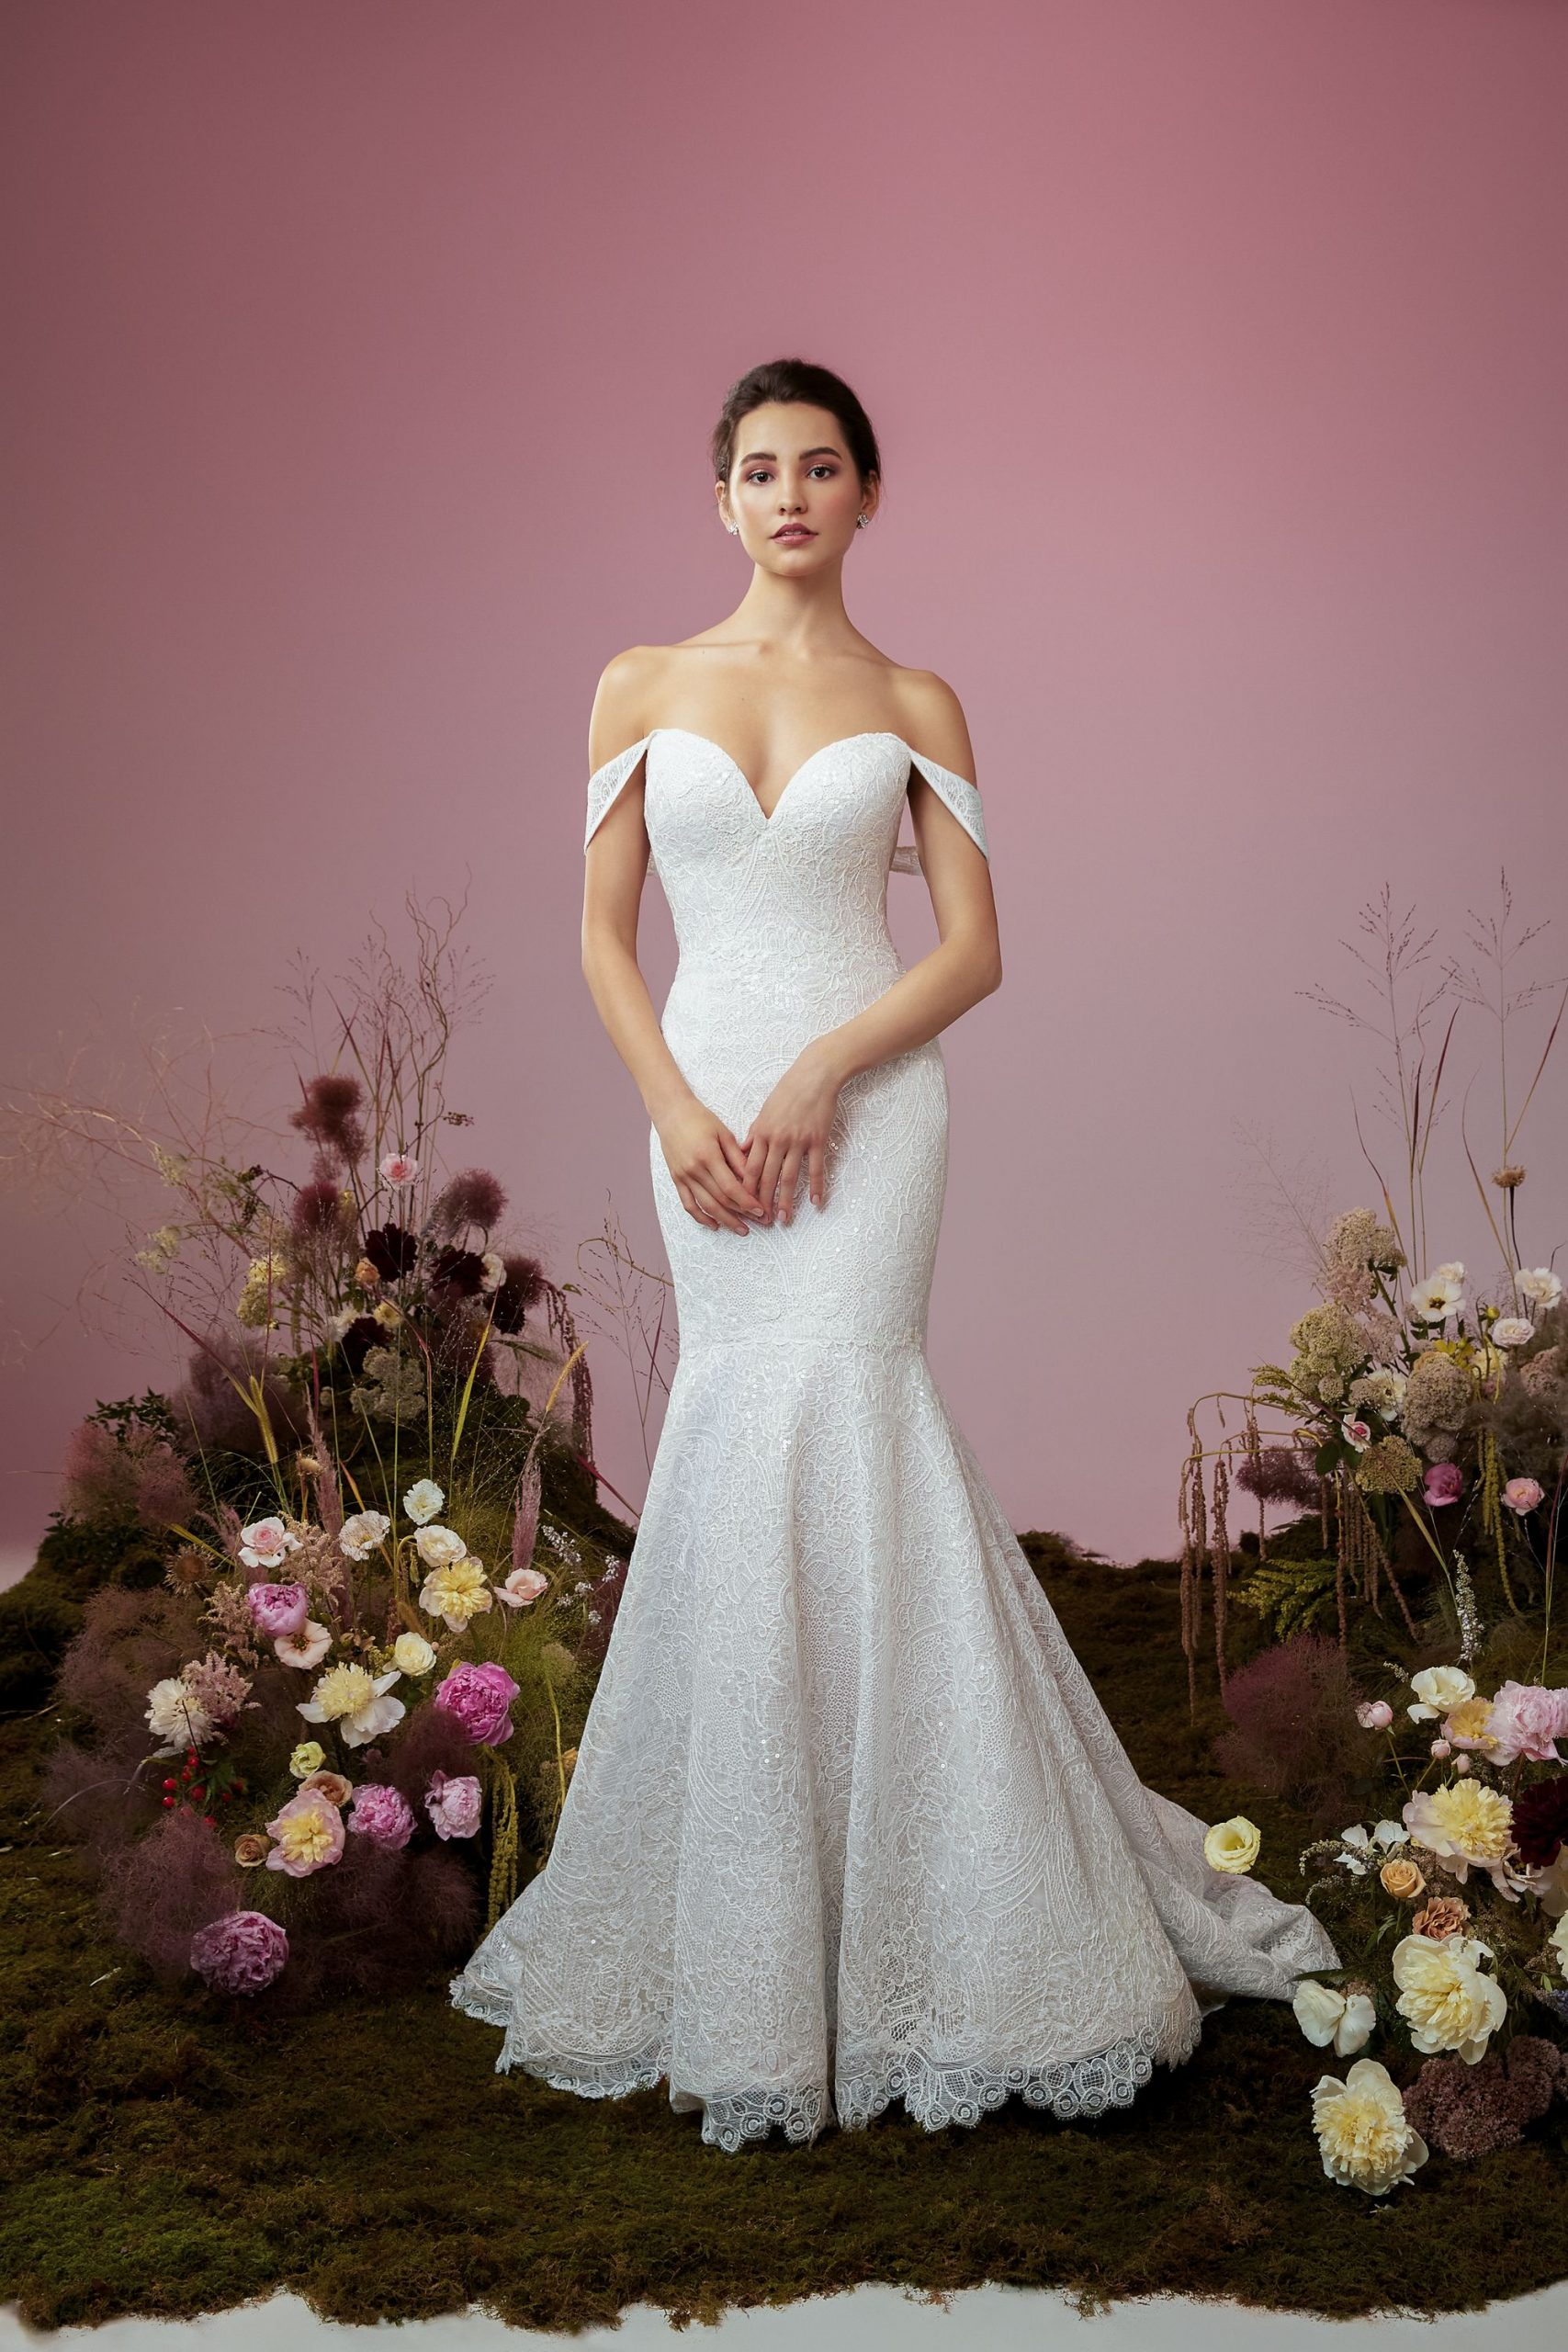 Strapless Mermaid Lace Wedding Dress   Kleinfeld Bridal